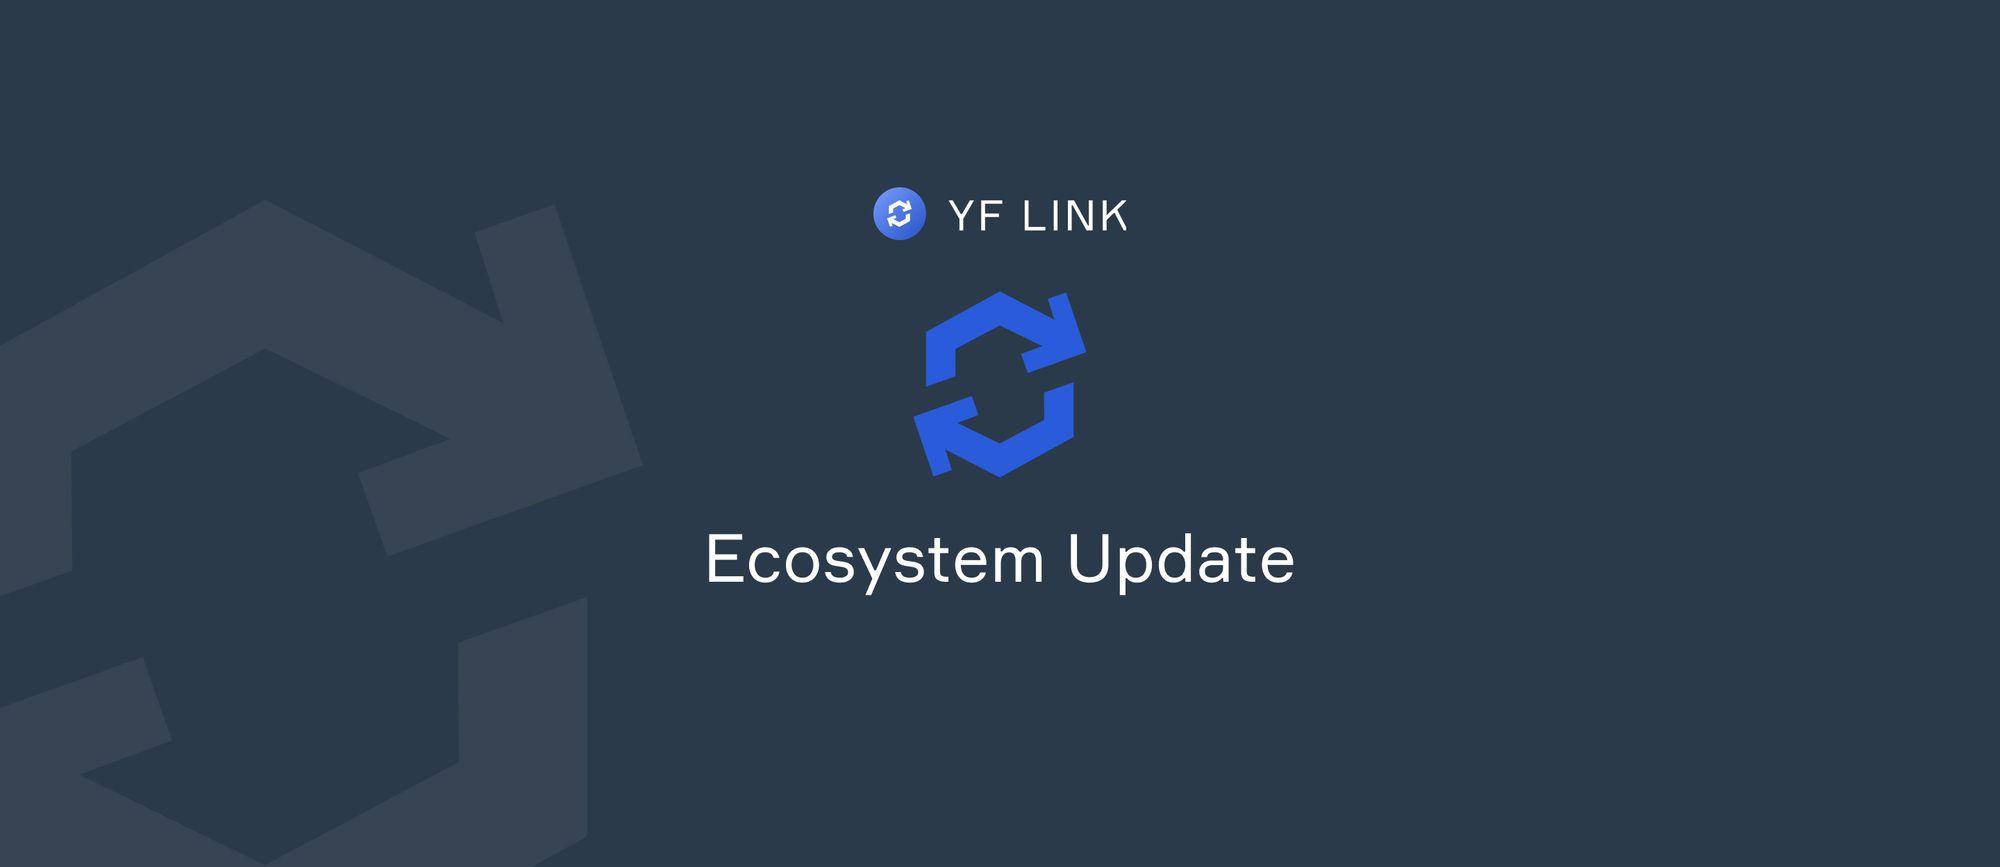 YF Link - Ecosystem Update